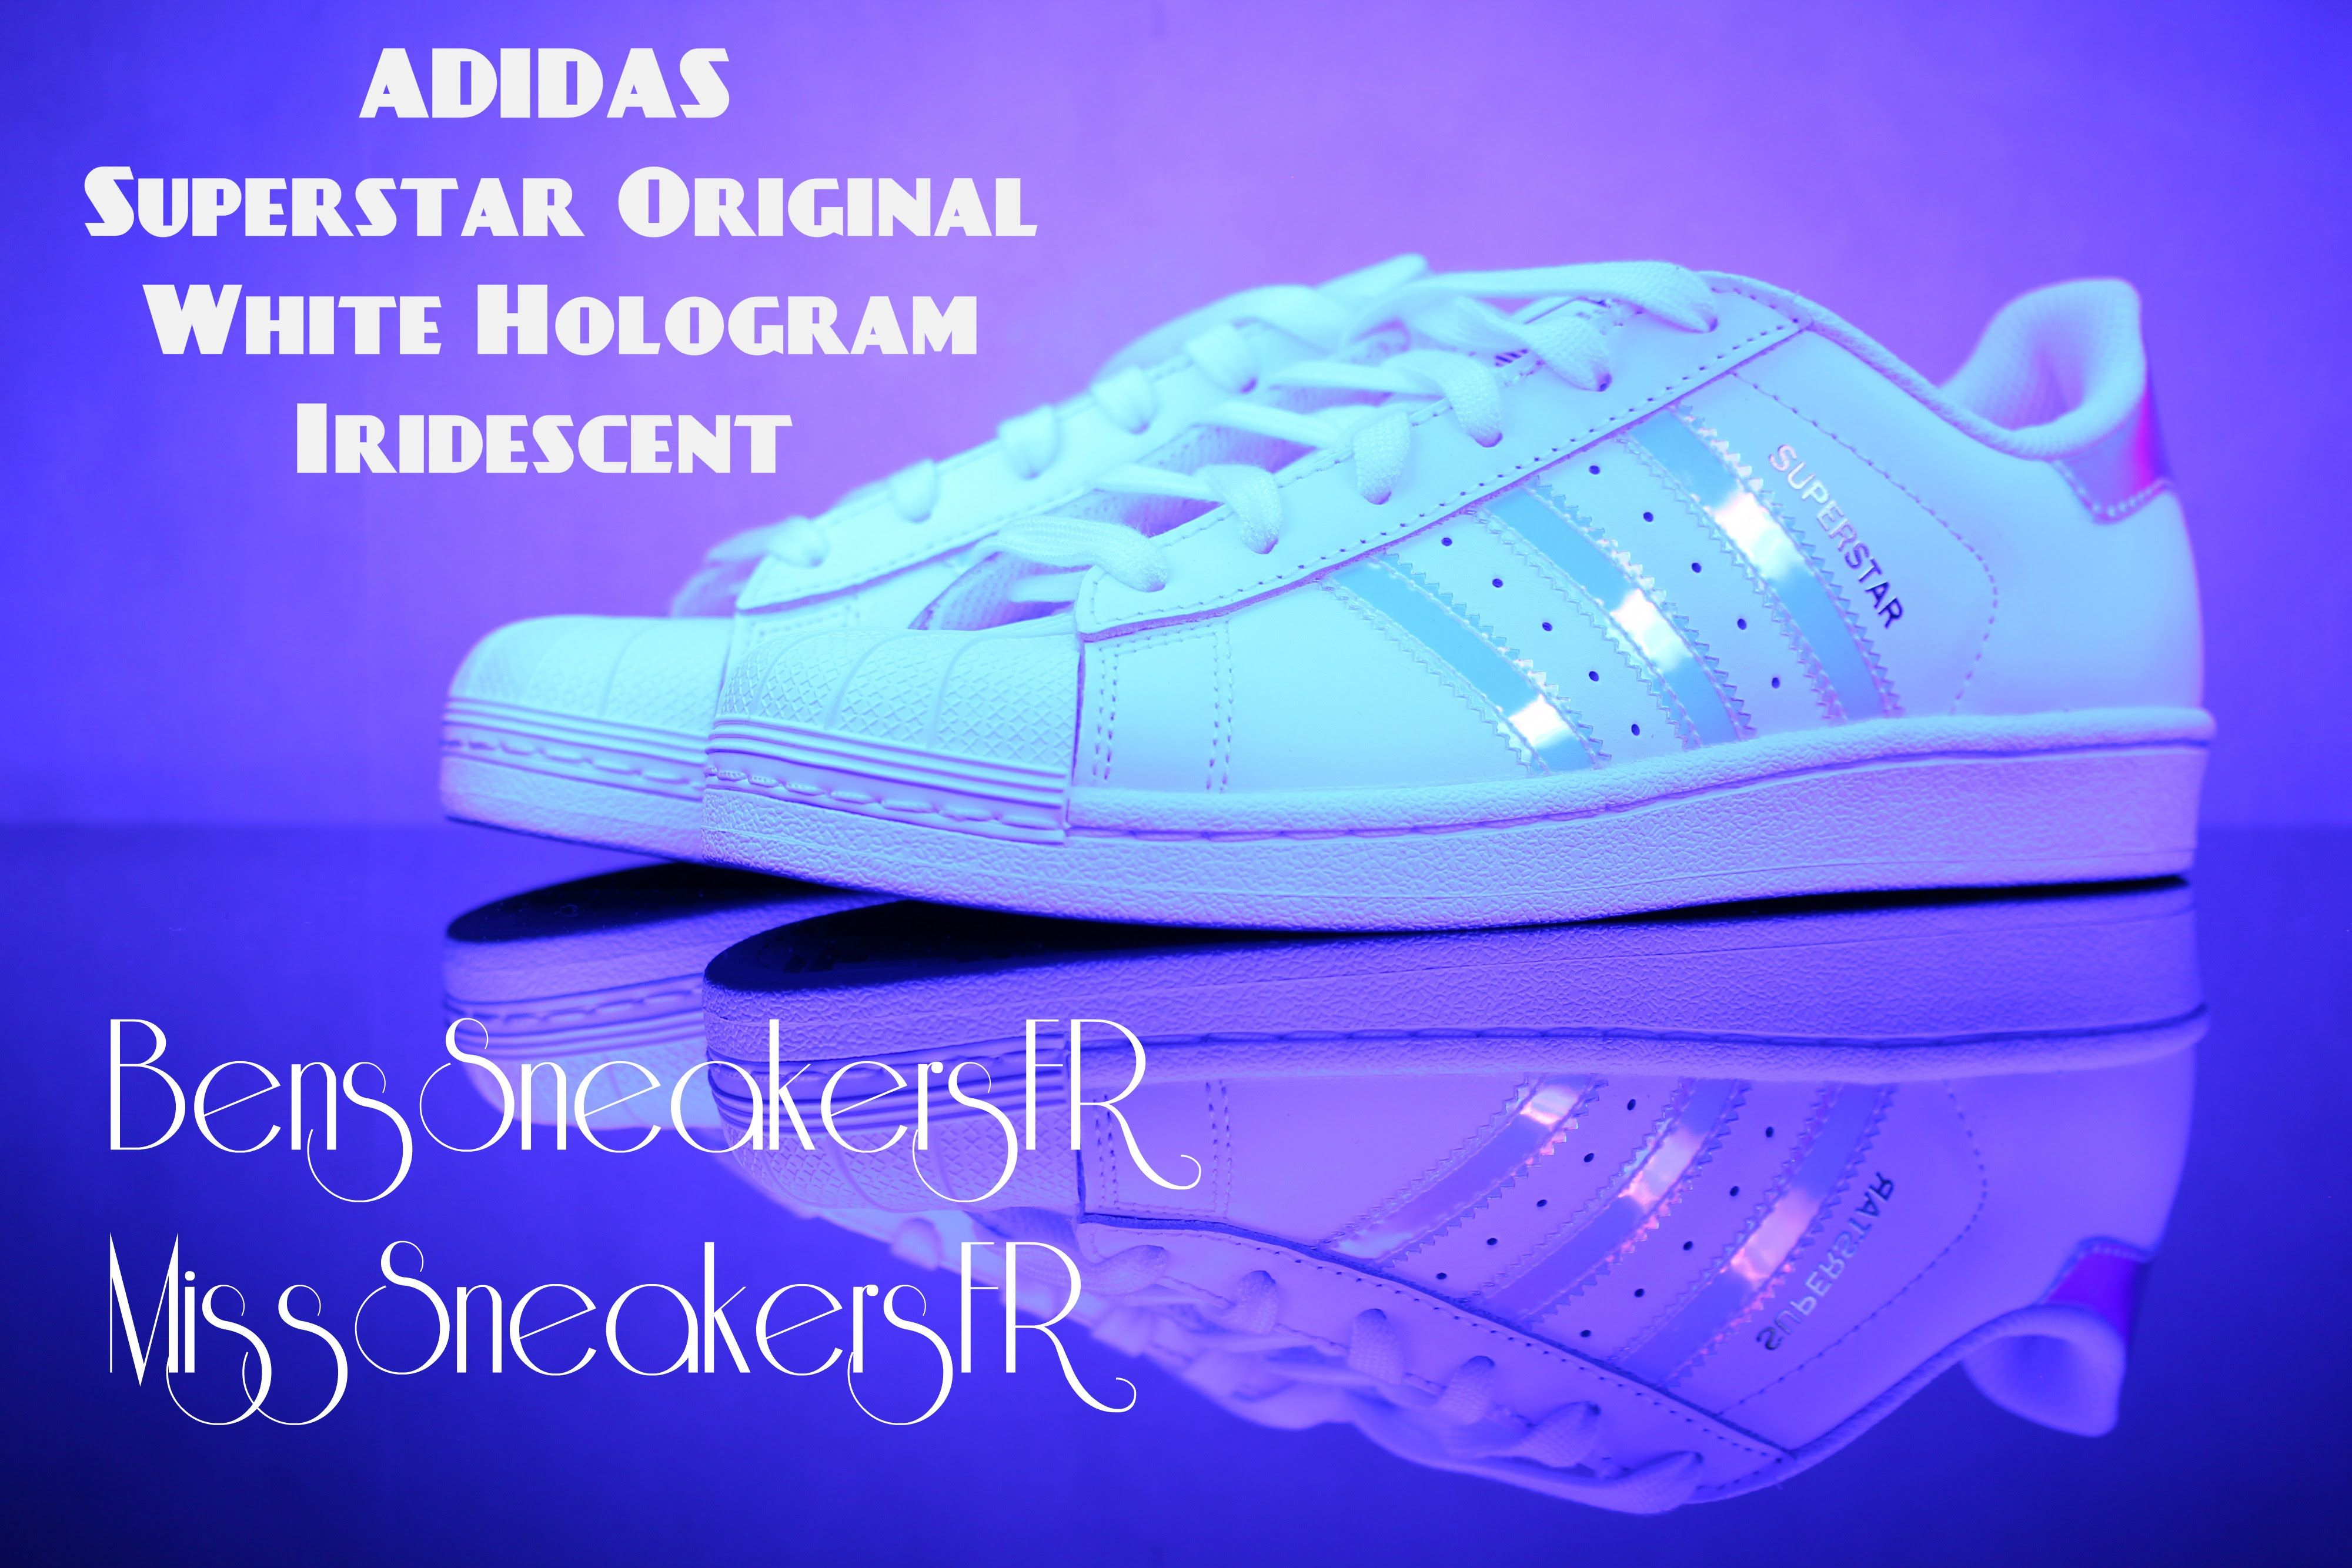 [MissSneakersFr] Adidas Superstar Original White Hologram Iridescent Jun.